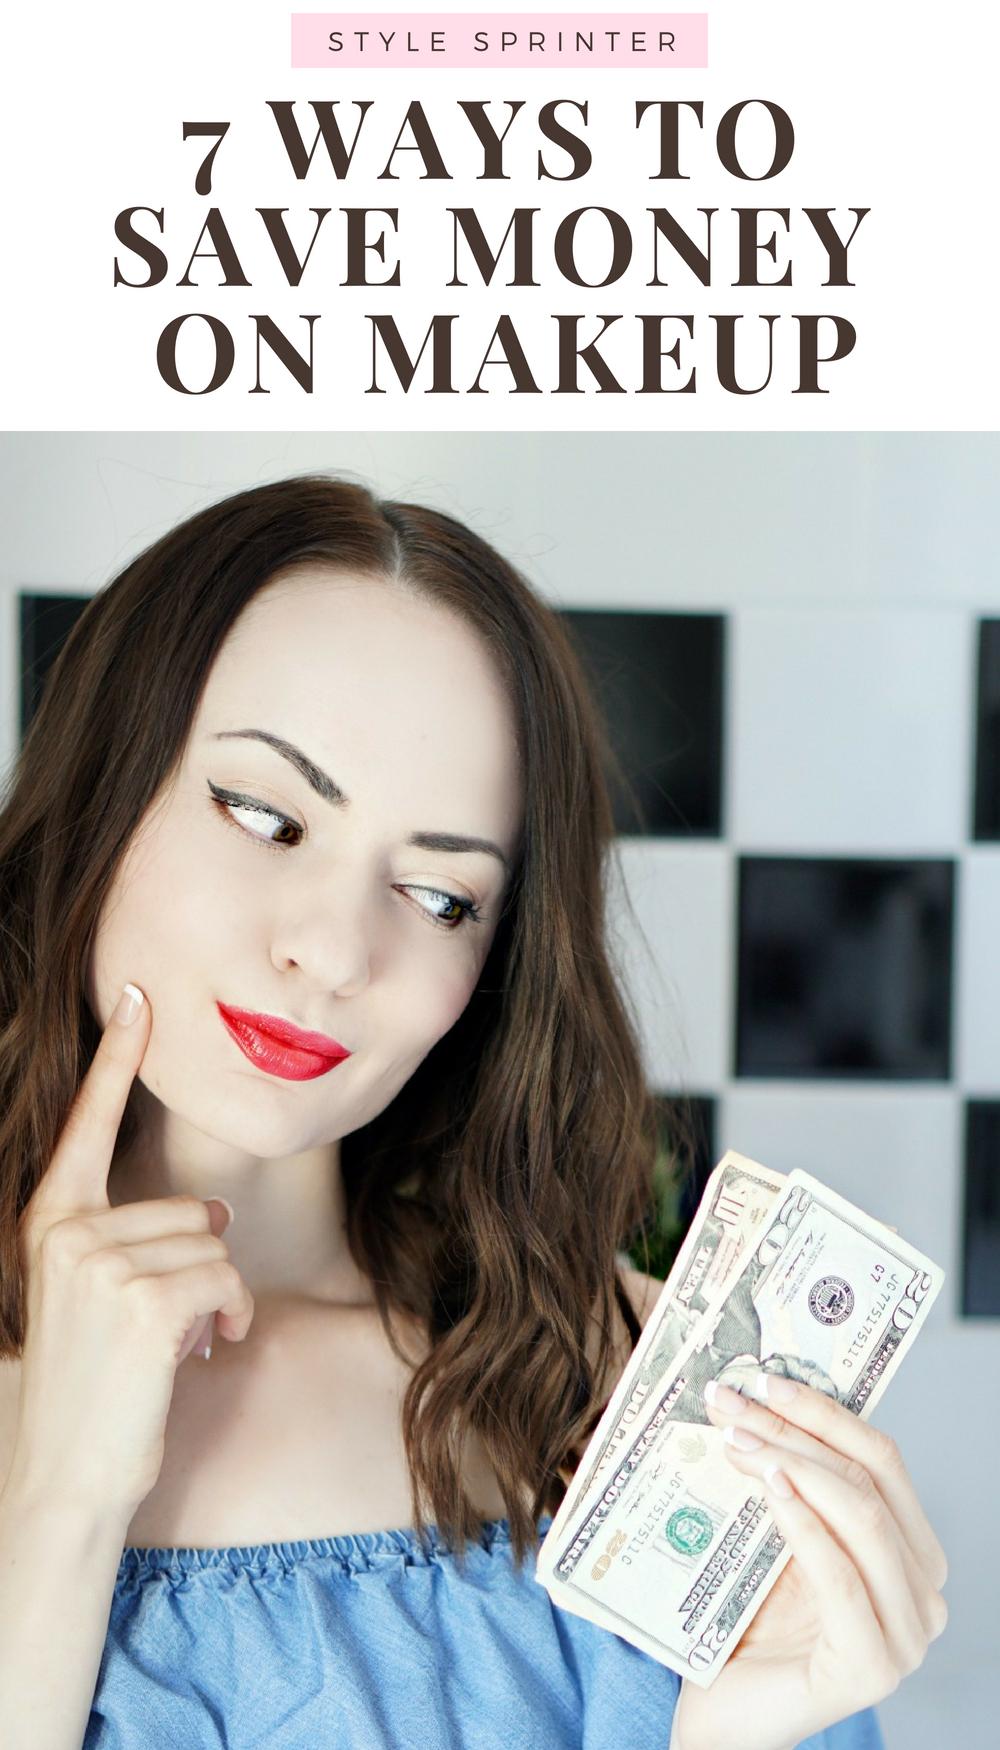 7 WAYS TO SAVE MONEY ON MAKEUP